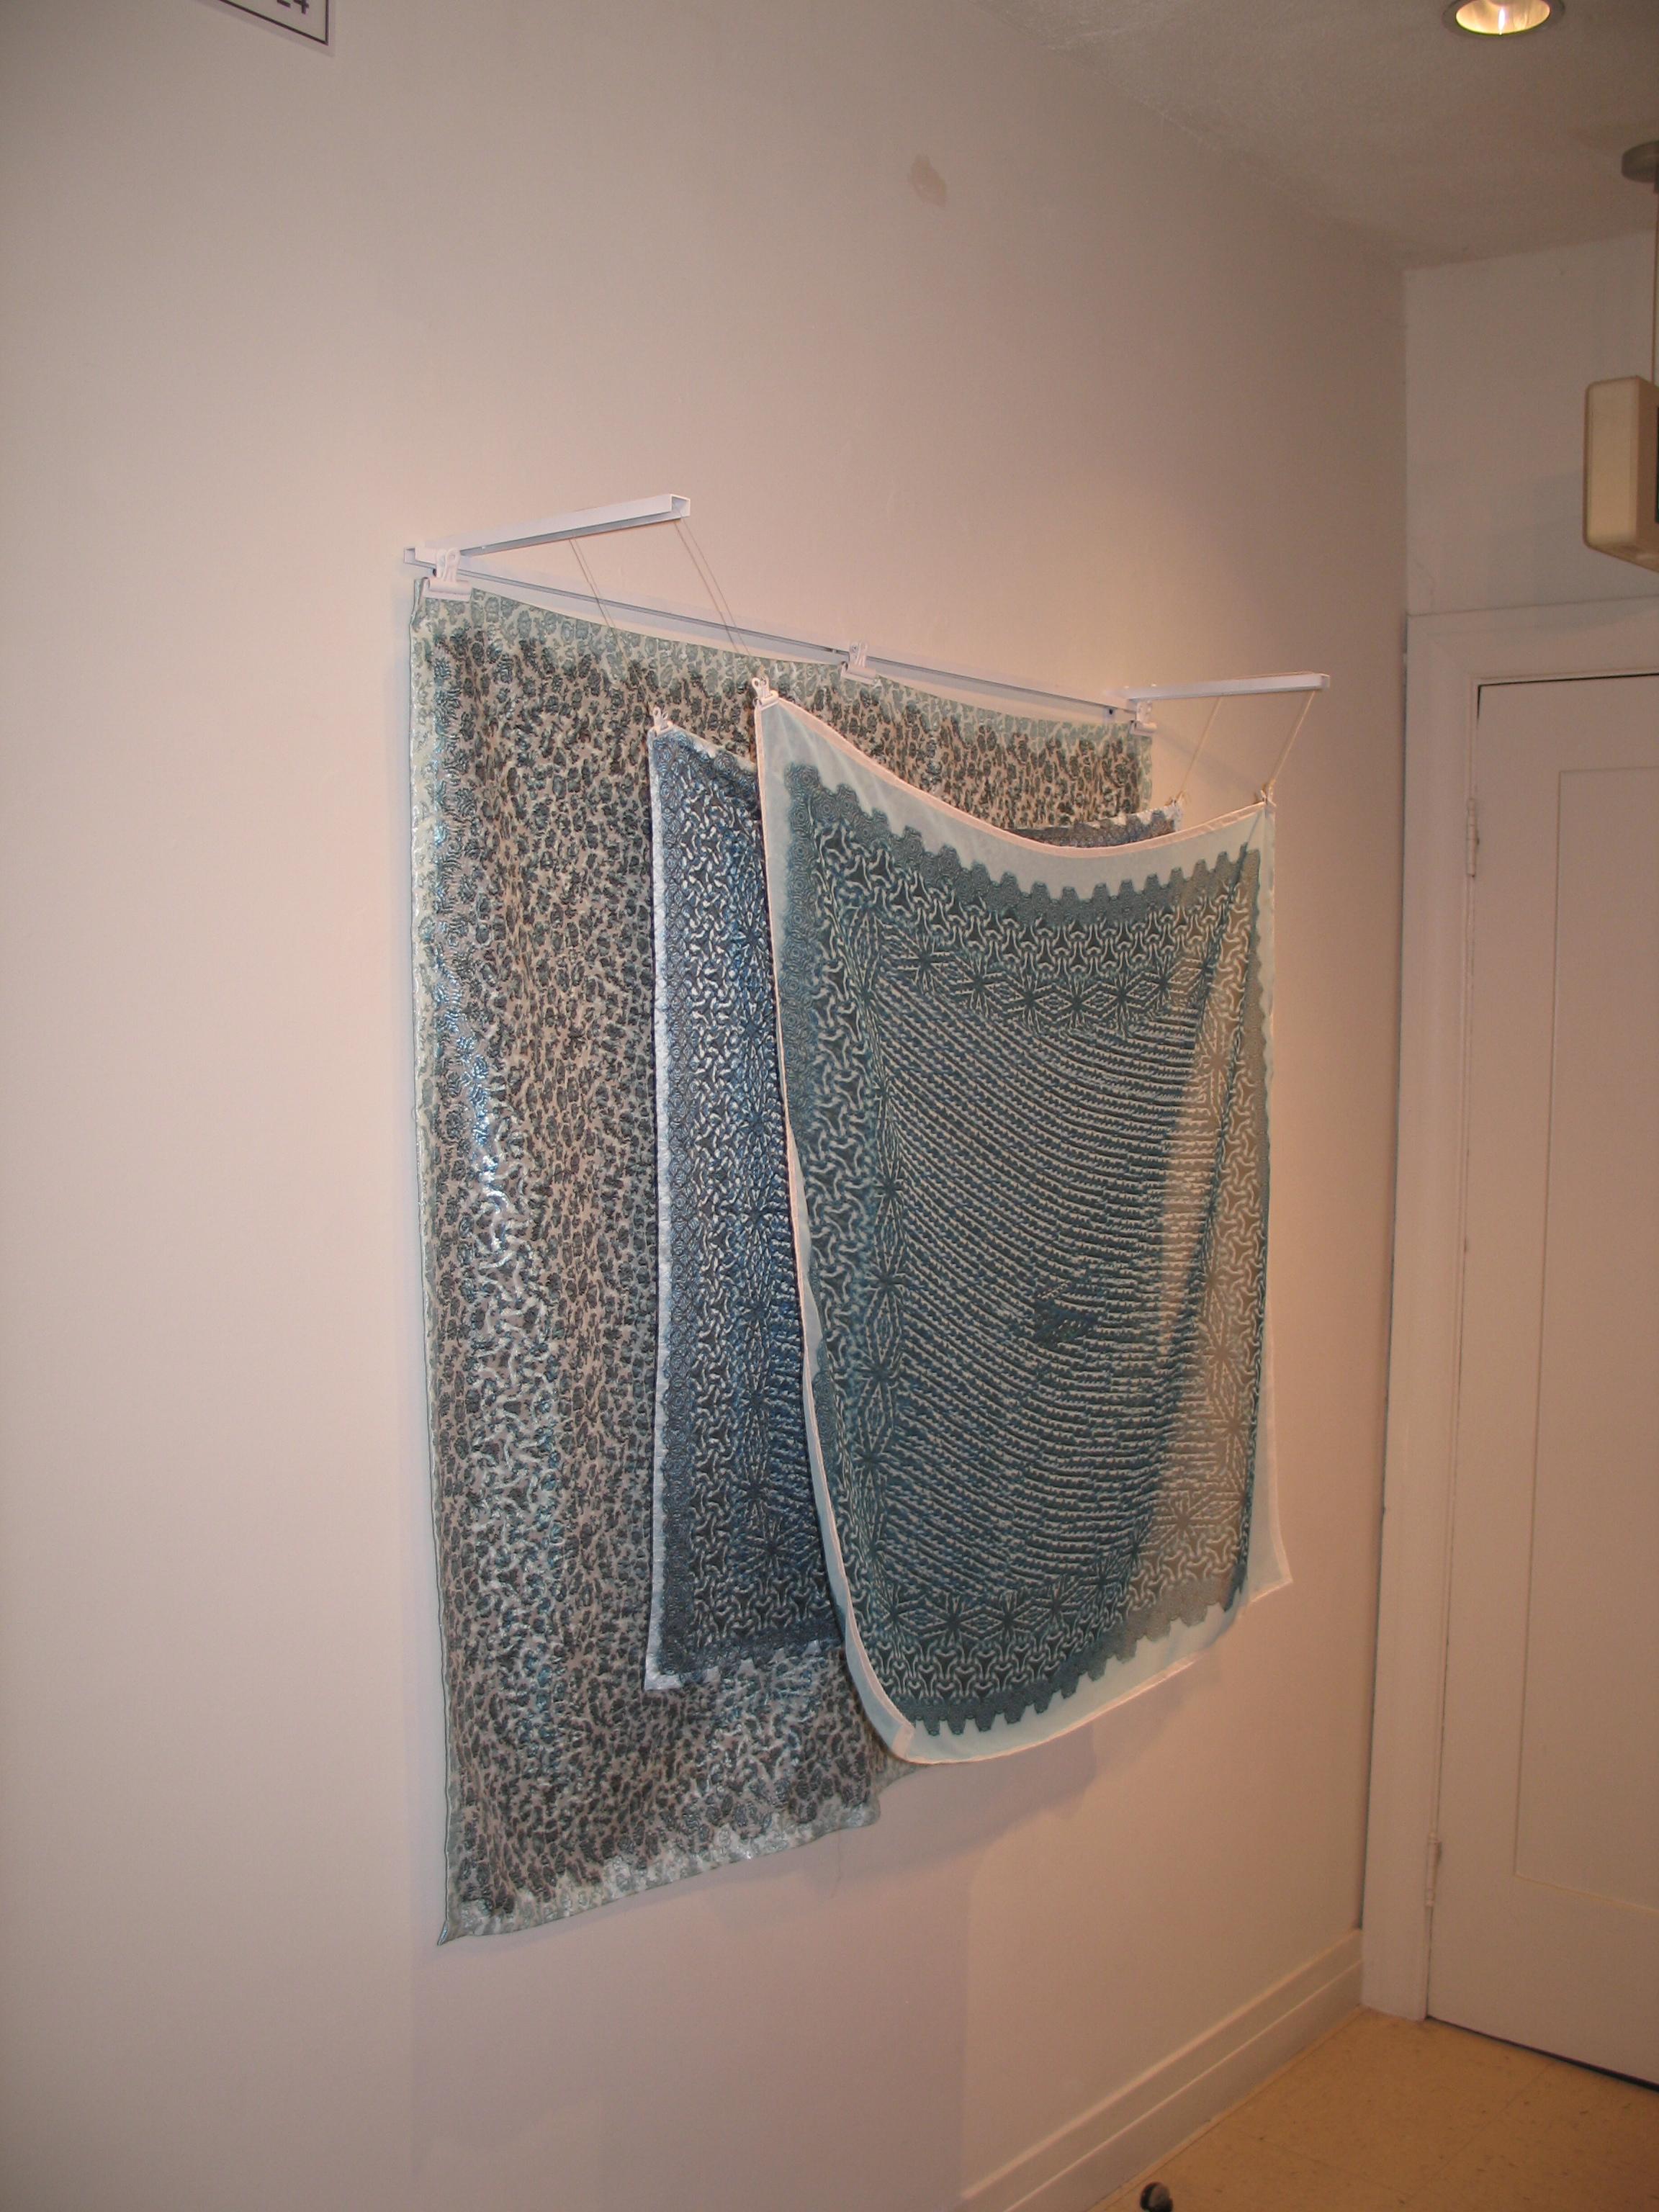 nb fabric_2_7021